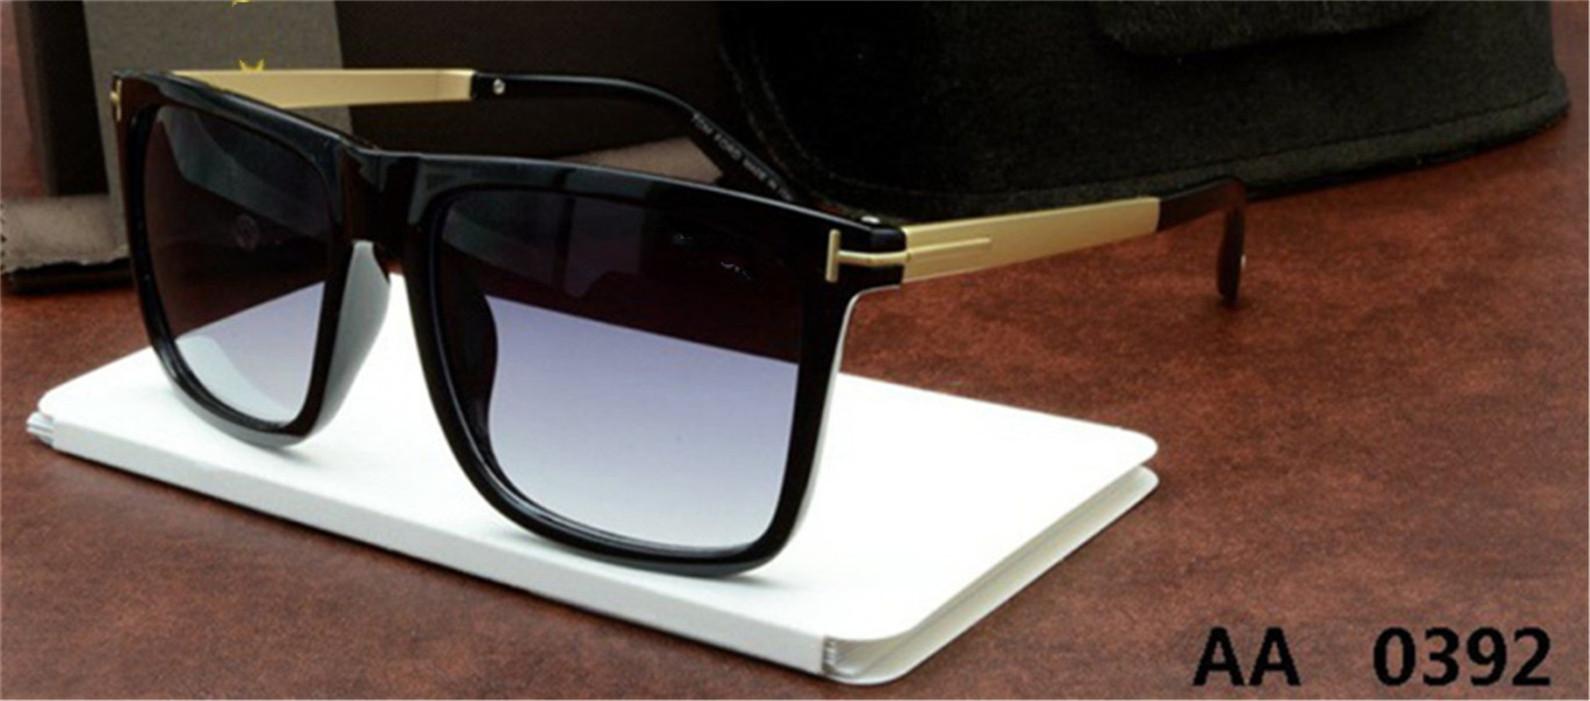 Designer Tom Luxury New Brand Sunglasses Men Women Sunglasses UV400 ford Lenses Trend Sunglasses 5178 5179 0392 tot